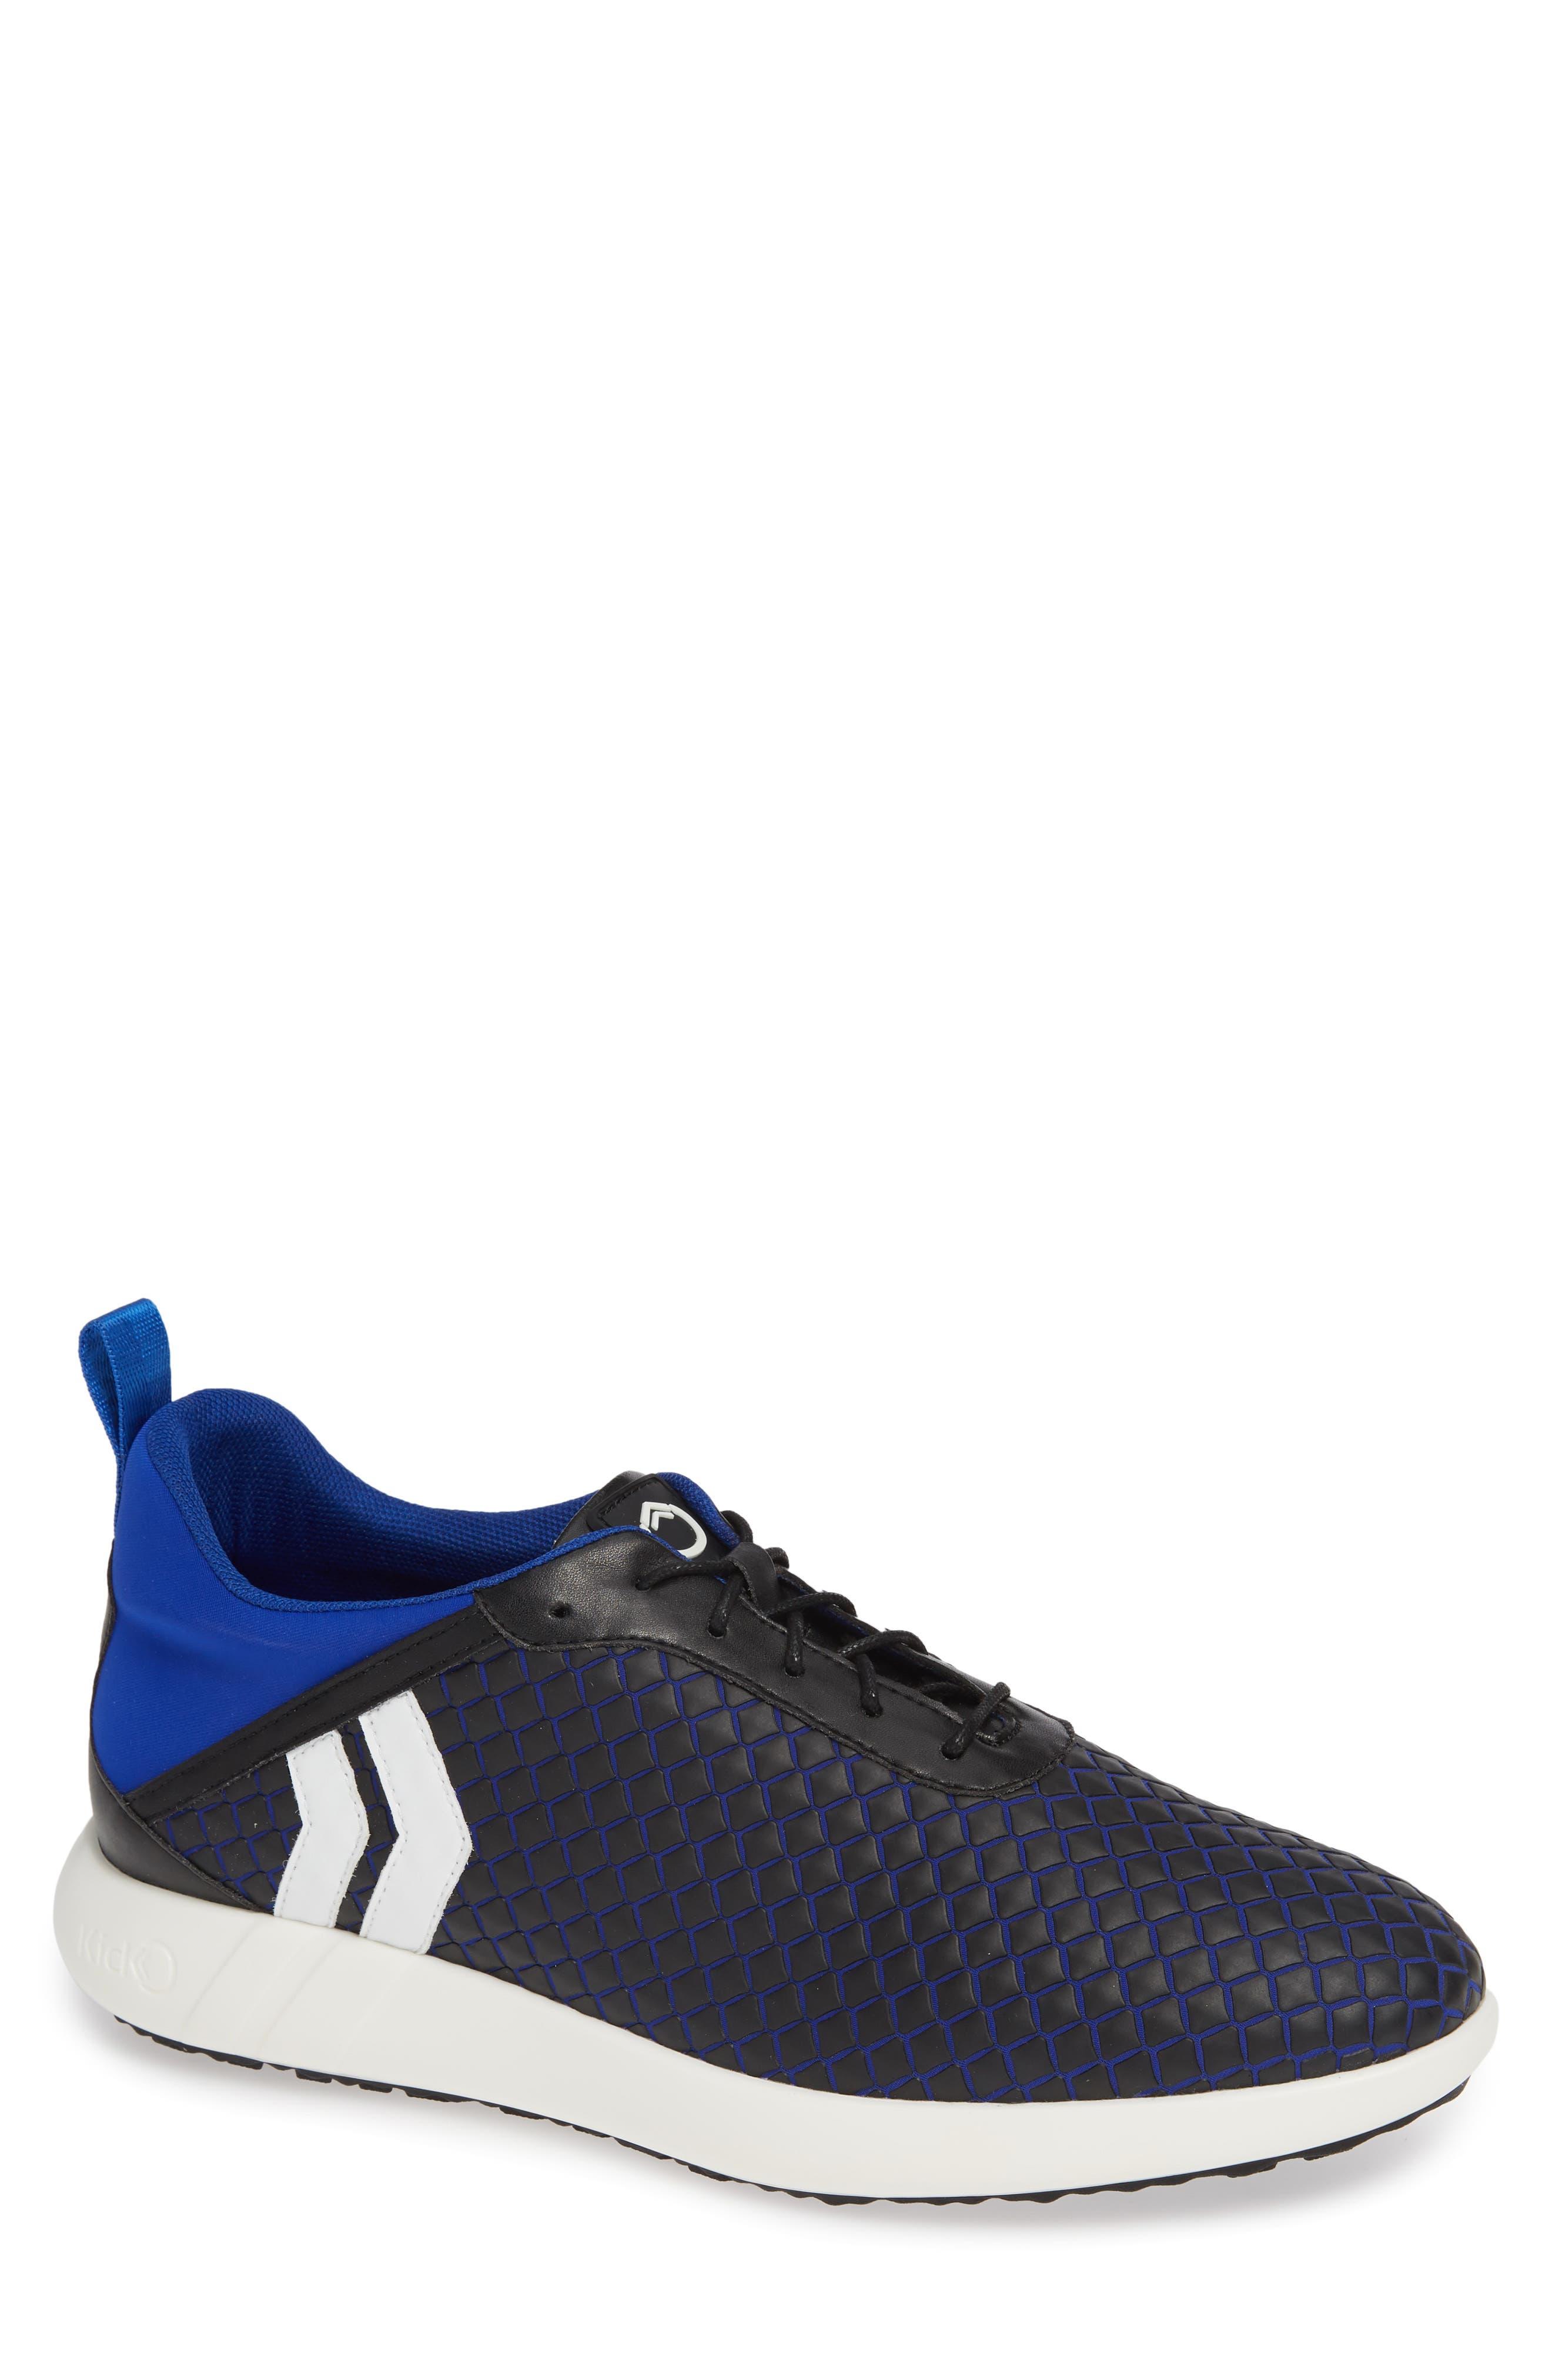 Onyx Sneaker,                             Main thumbnail 1, color,                             430